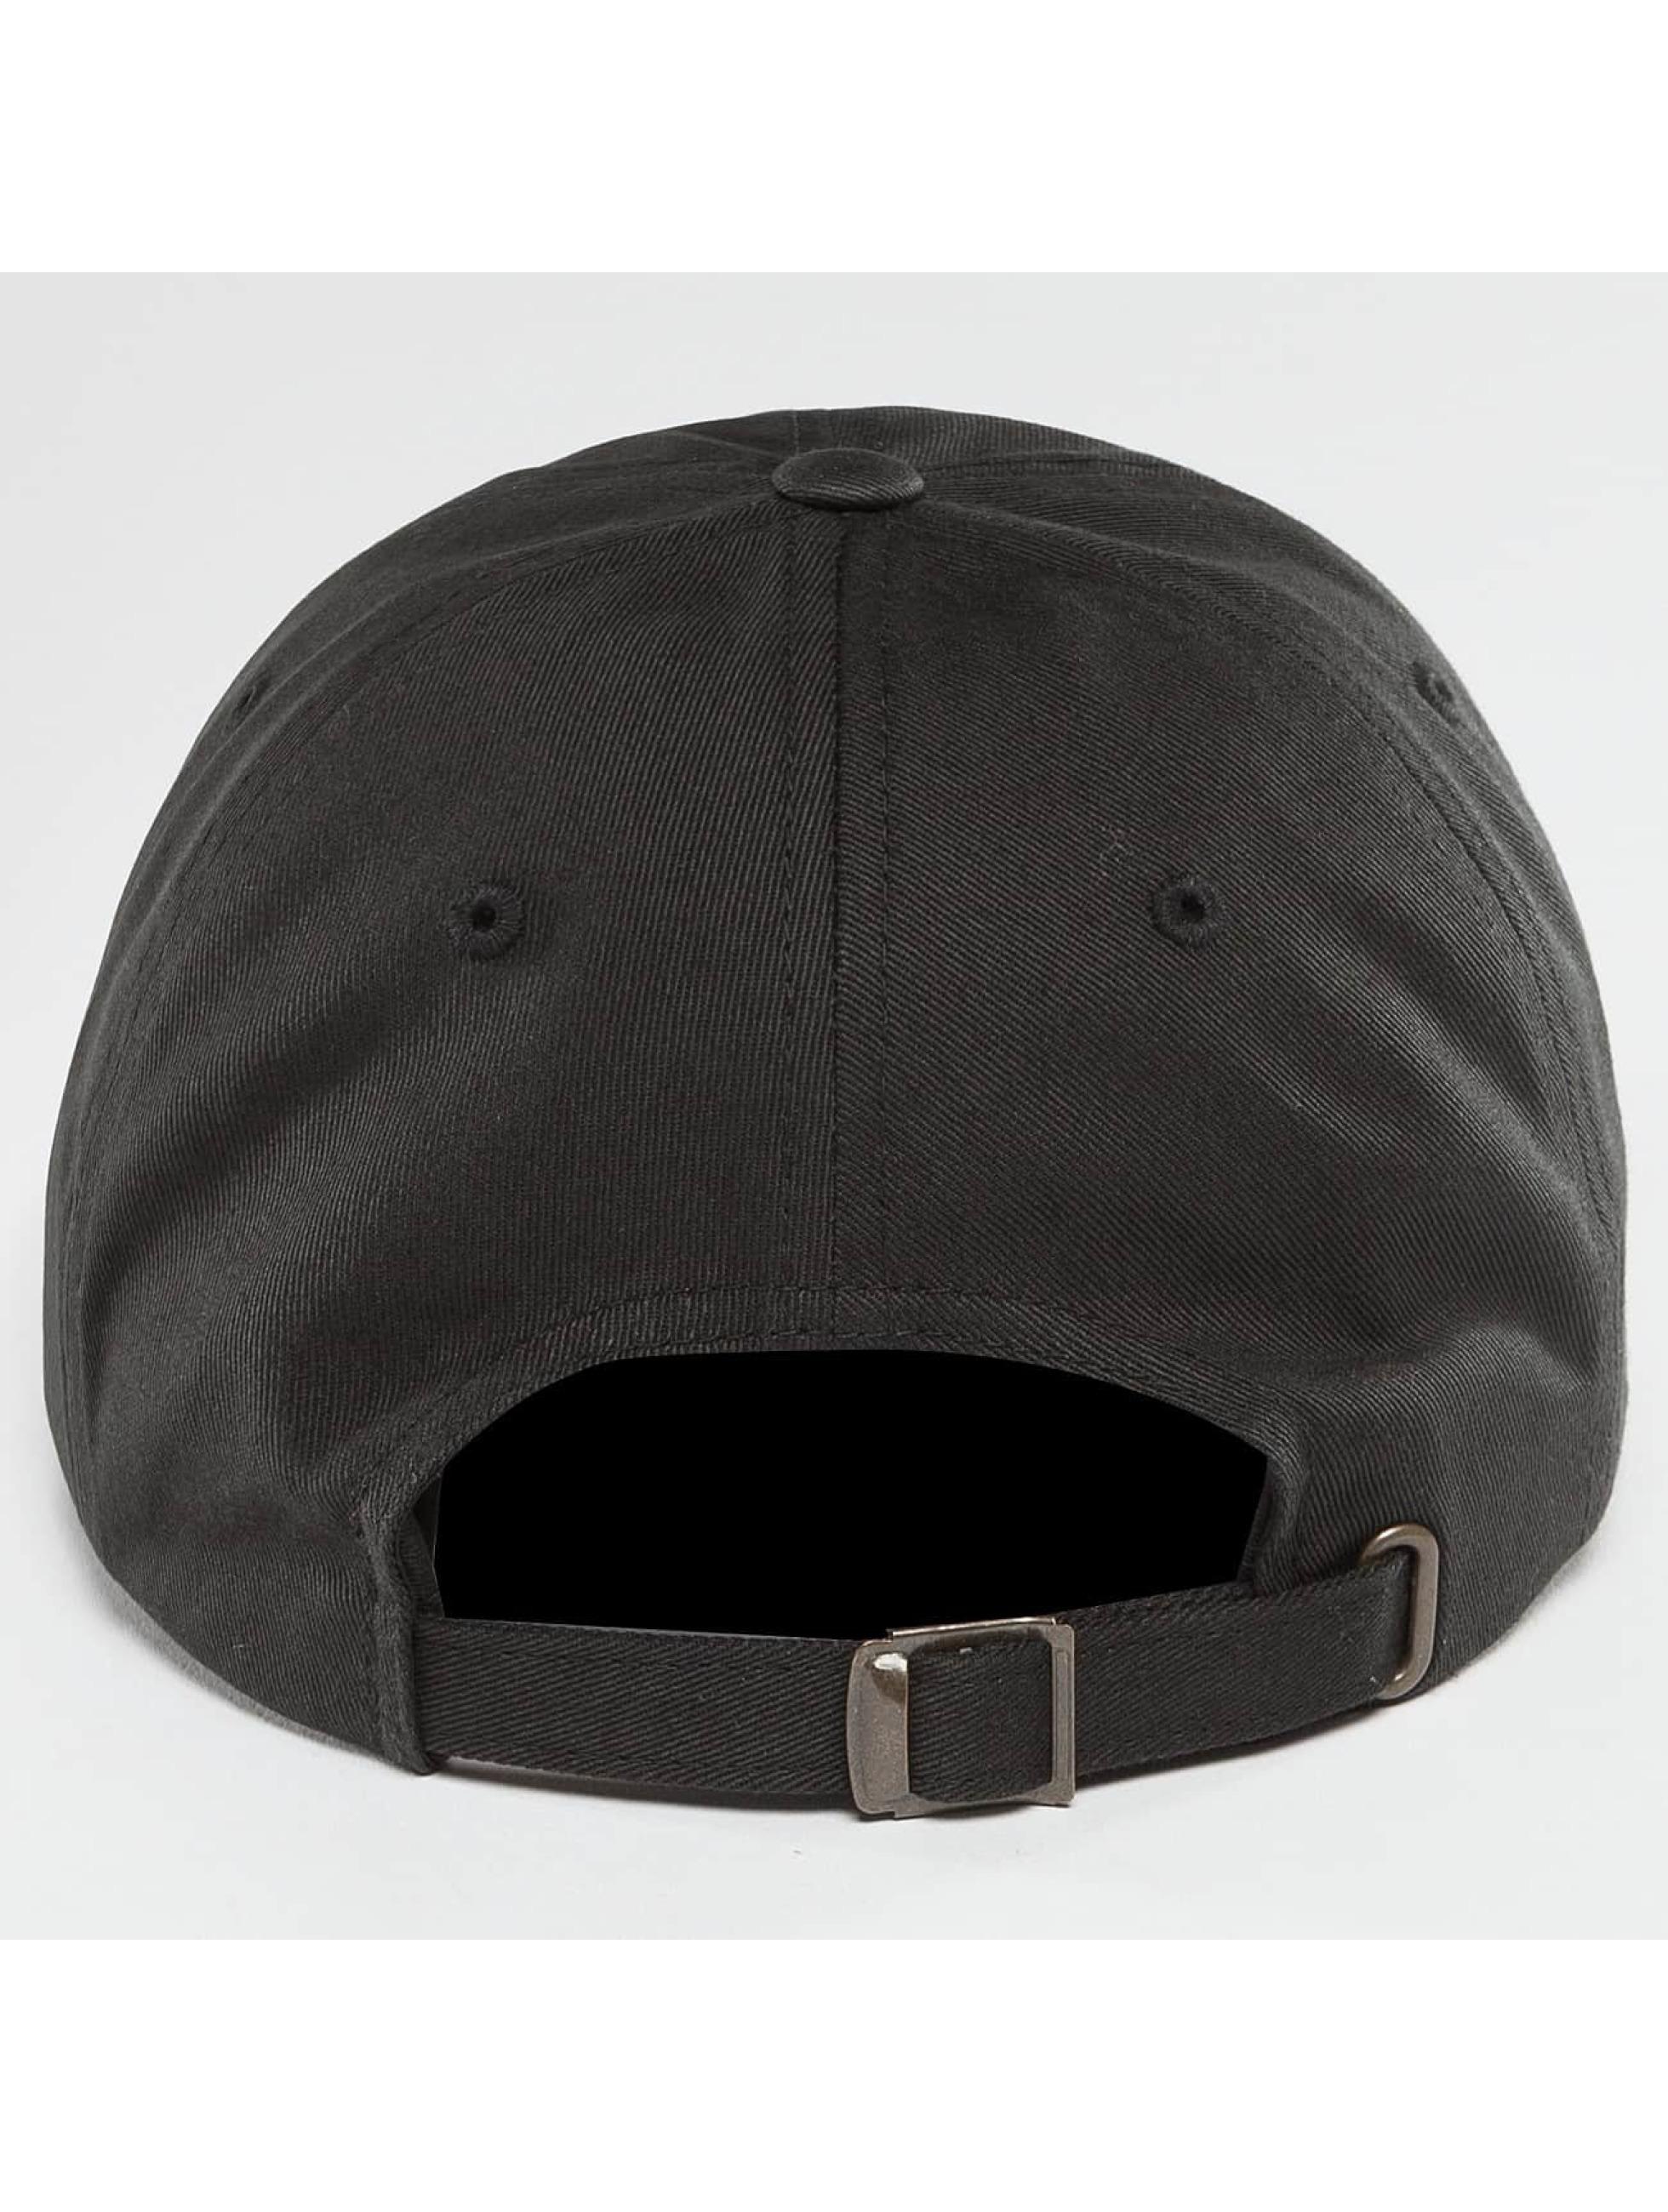 TurnUP Casquette Snapback & Strapback Collab noir